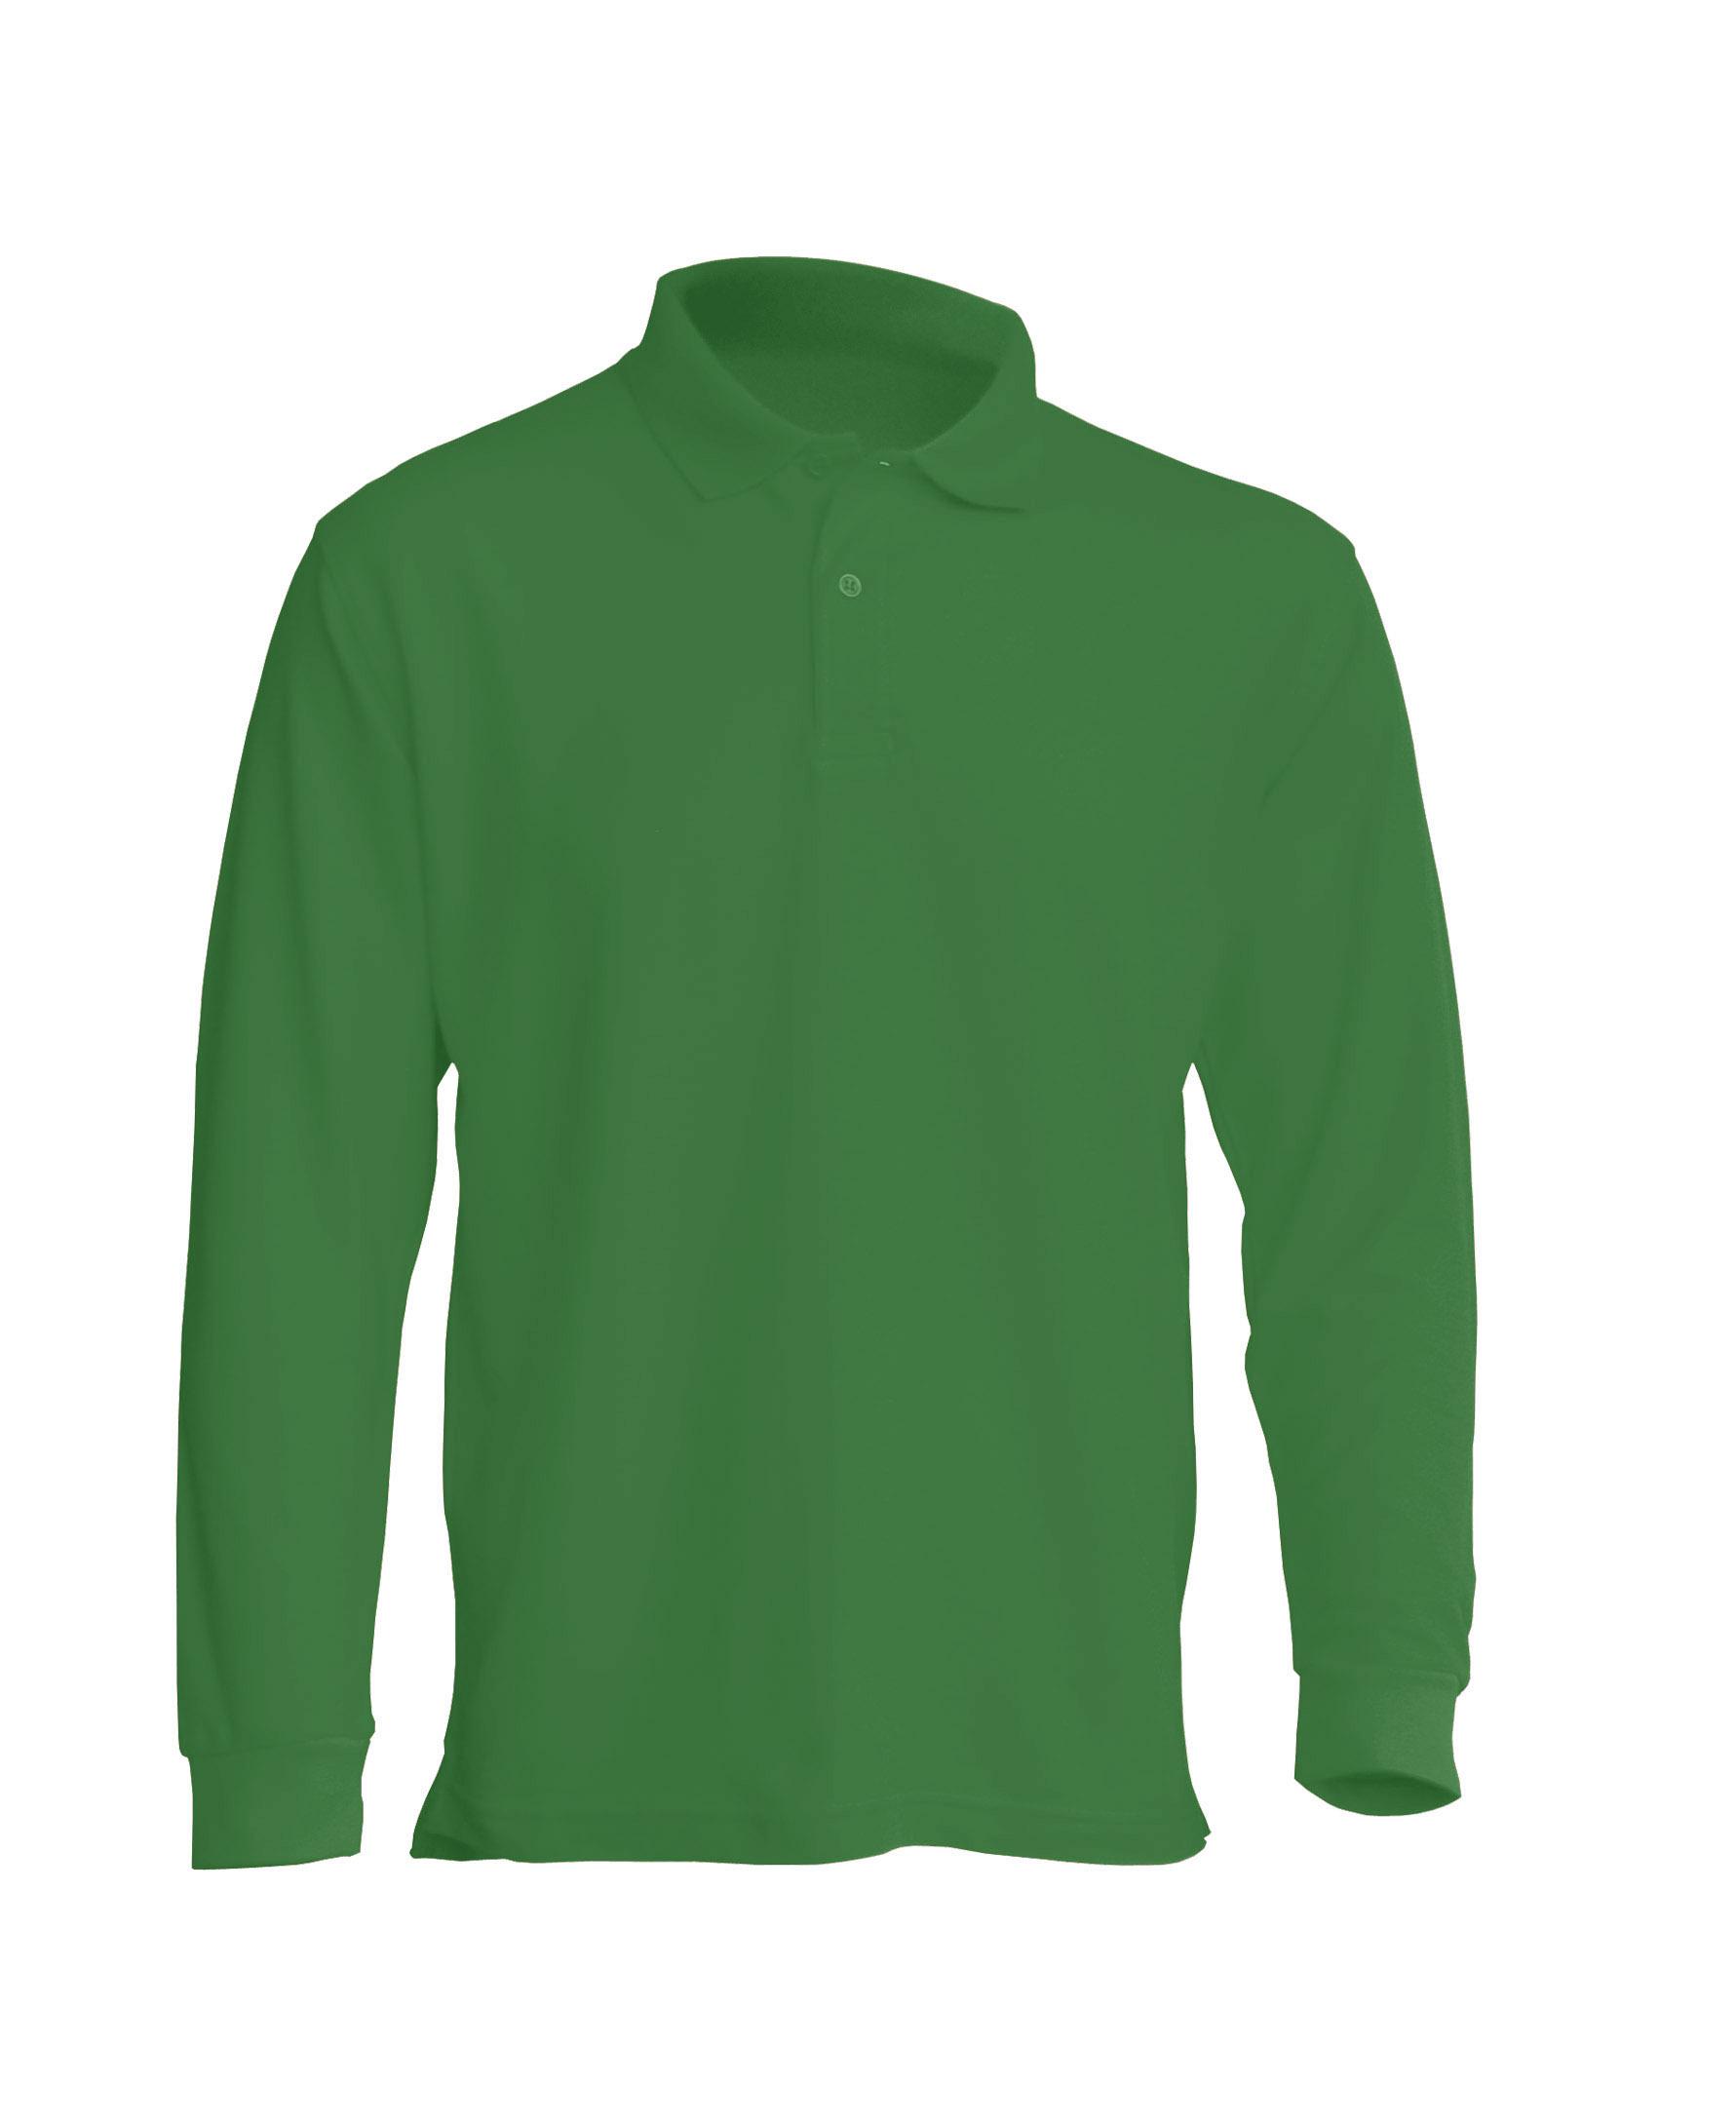 Majica polo dugi rukav kelly green